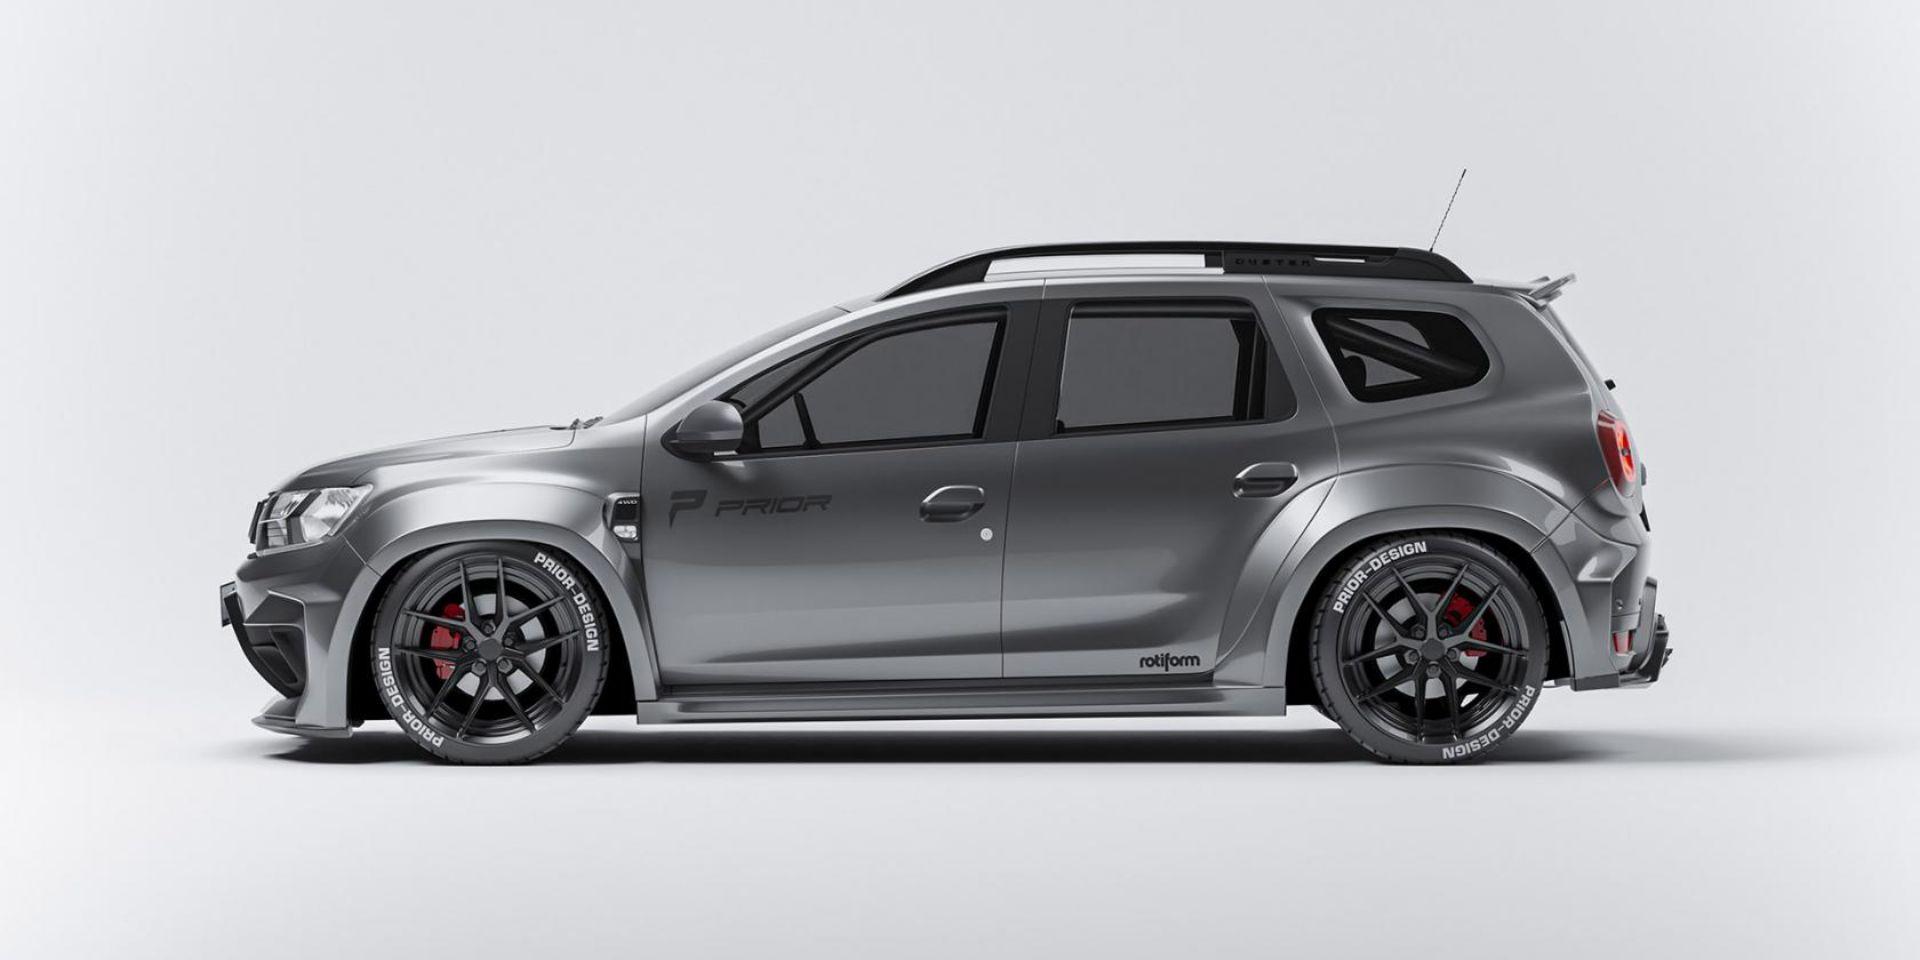 Dacia-Duster-by-Prior-Design-4